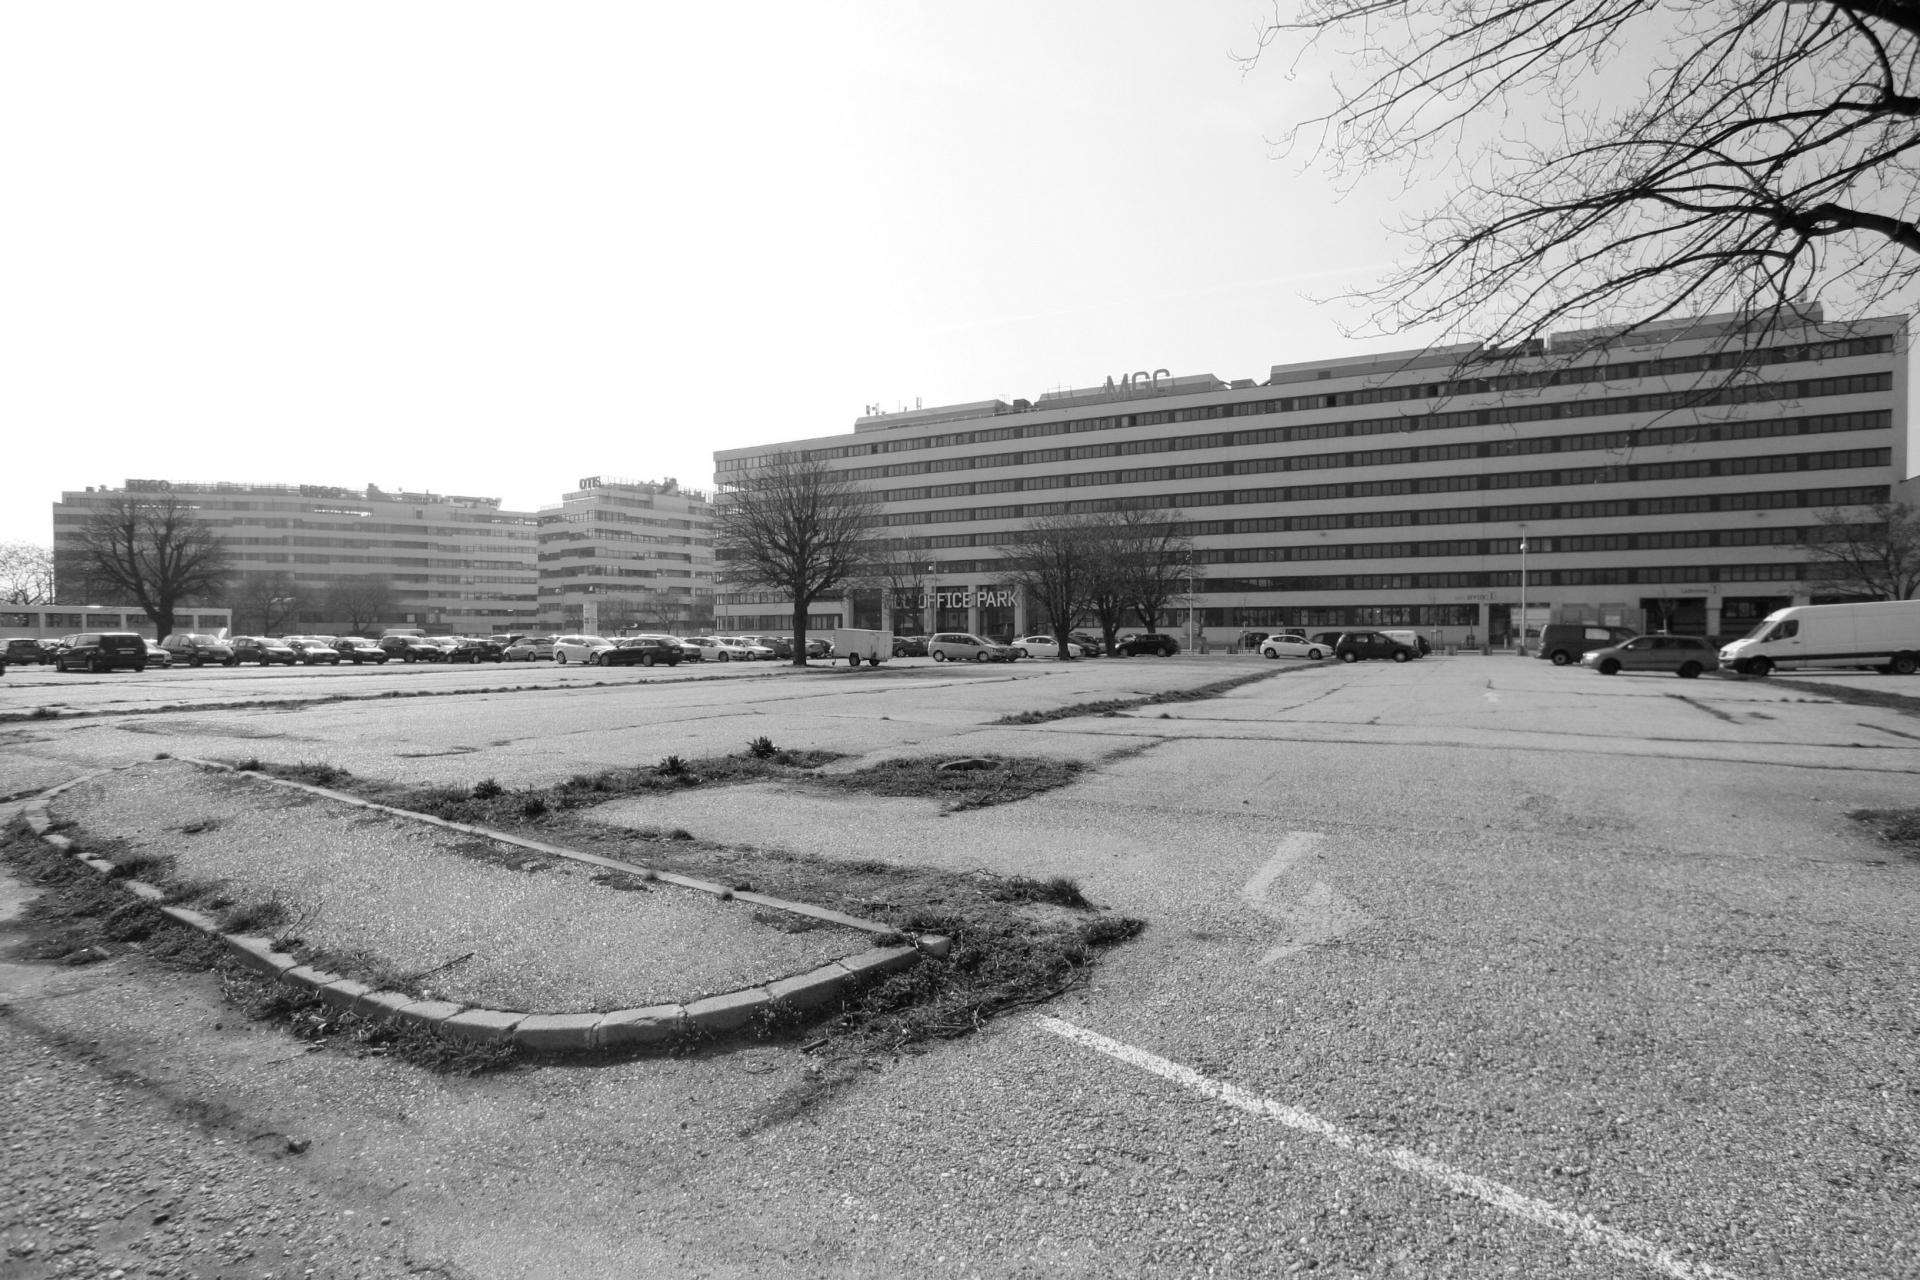 Schenker Salvi Weber MGC Plaza Wien